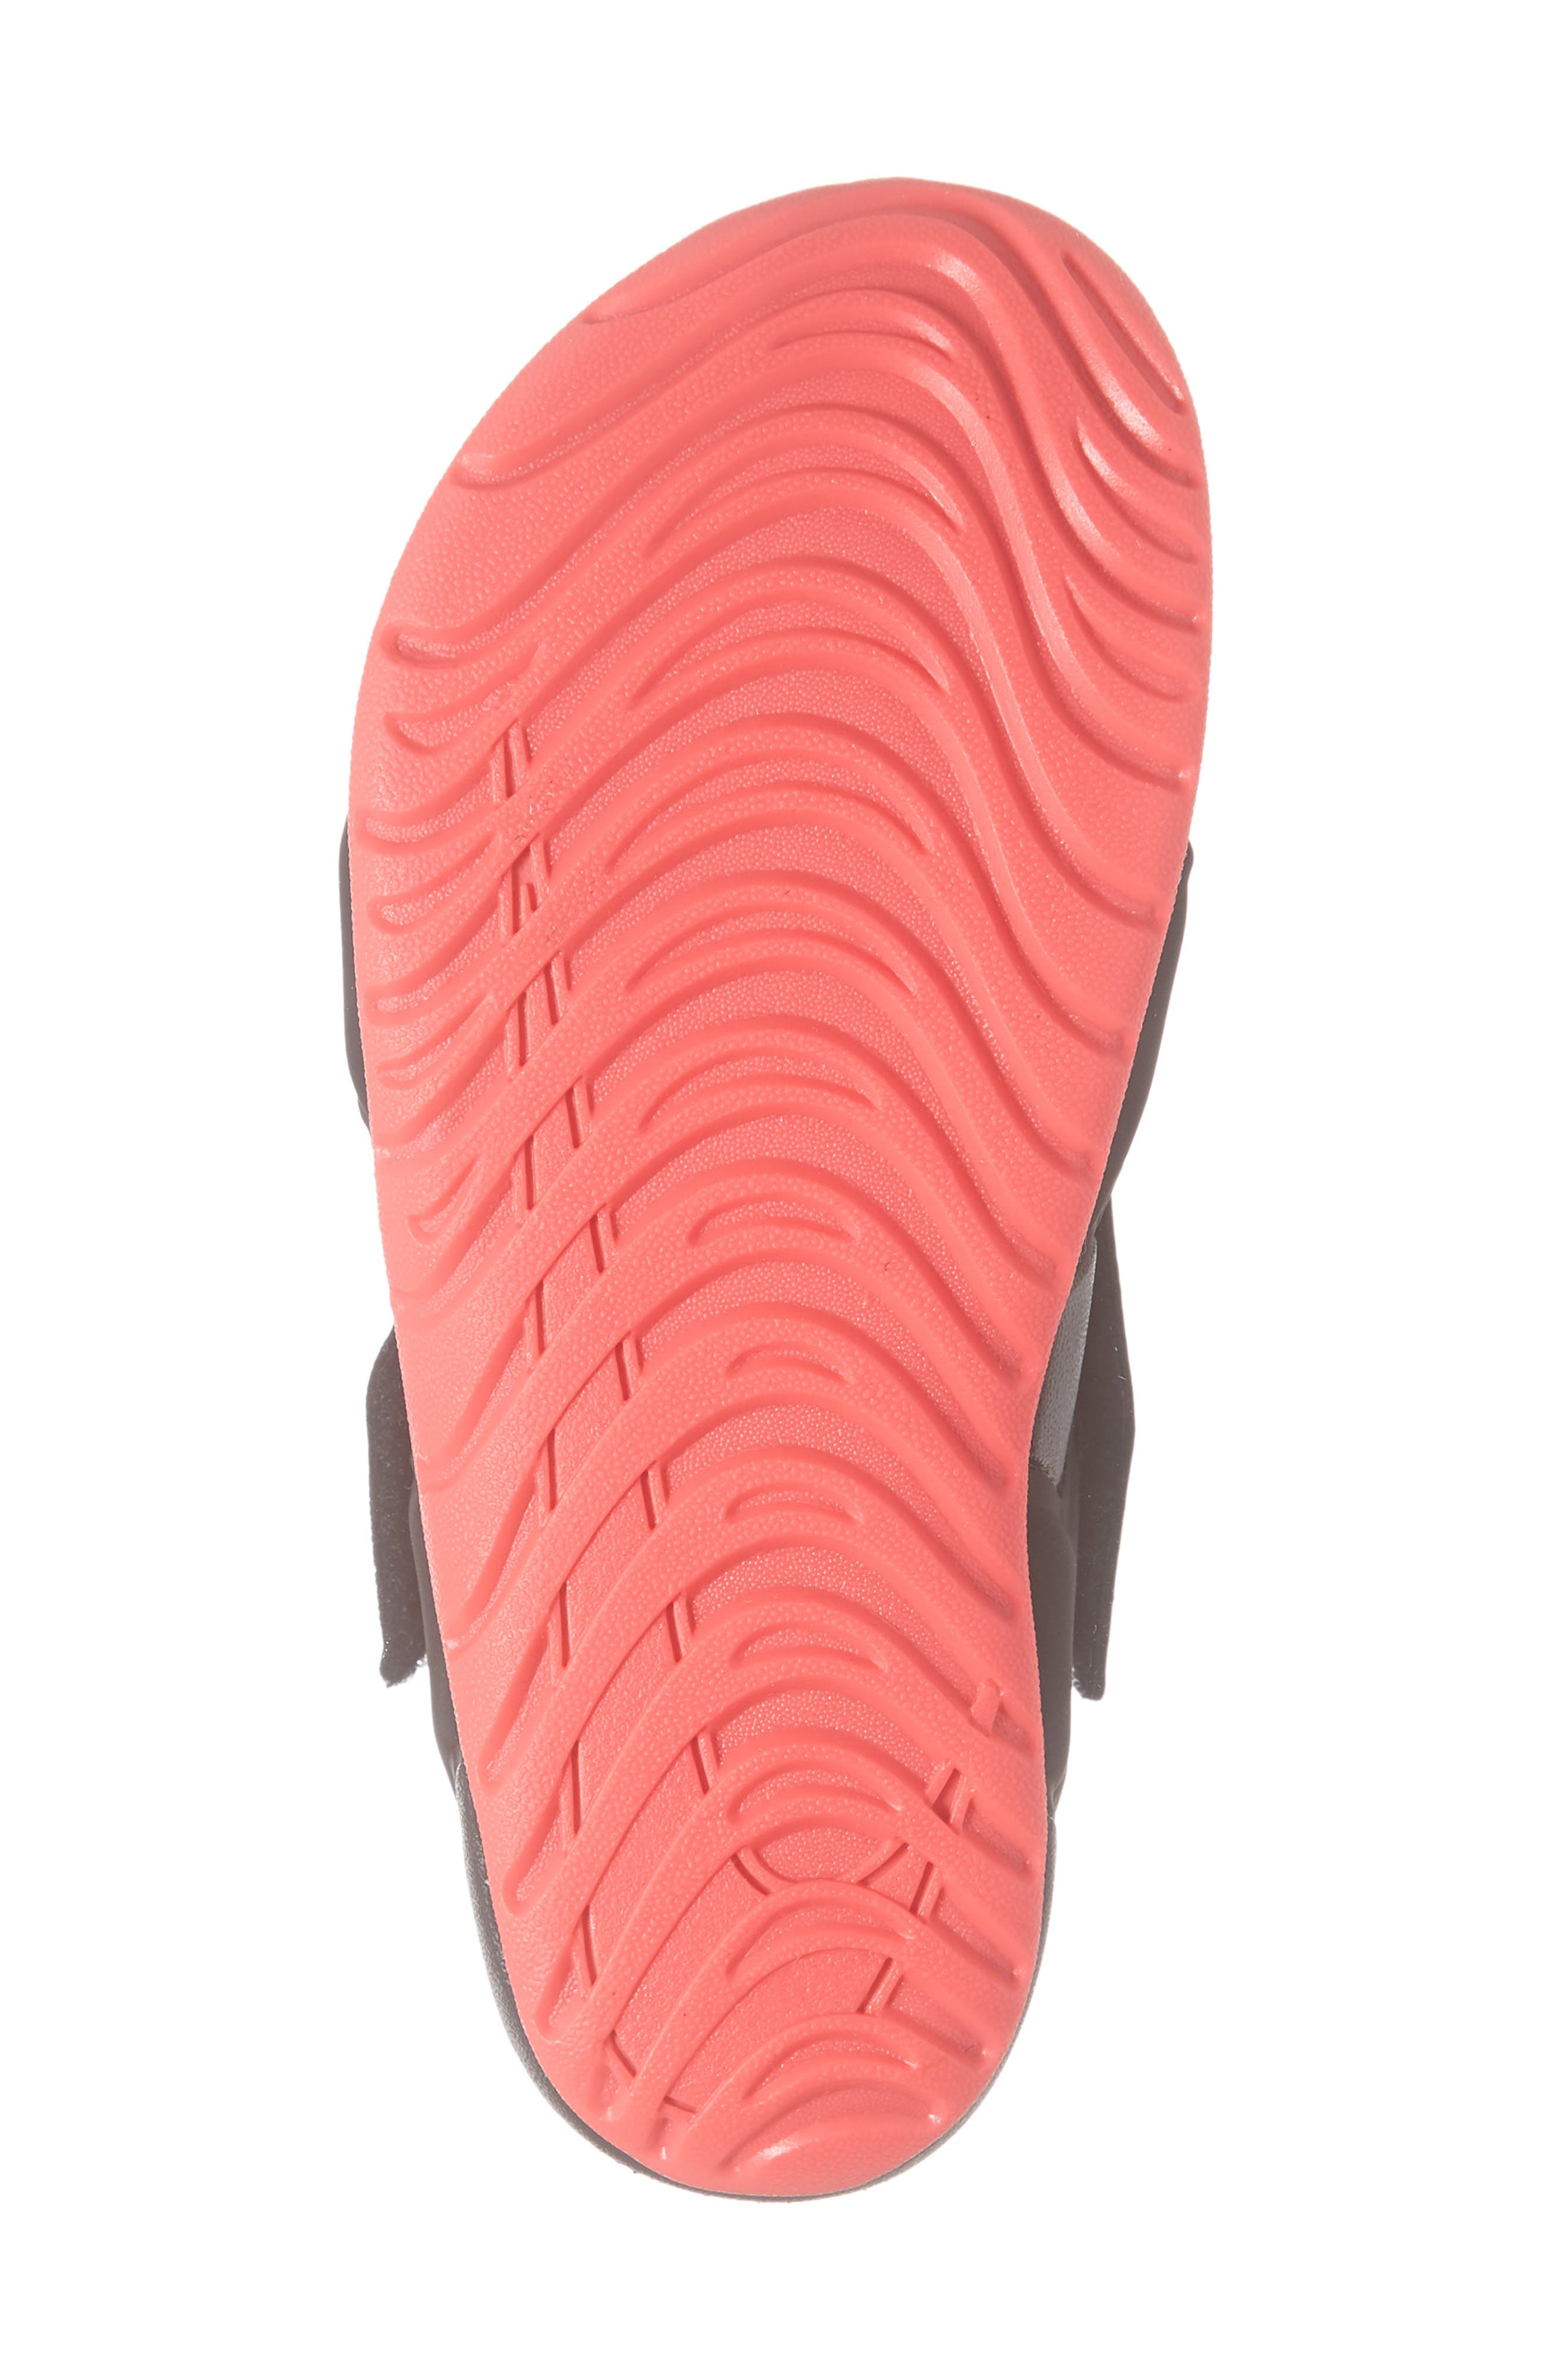 NIKE, Sunray Protect 2 Sandal, Alternate thumbnail 6, color, BLACK/ RACER PINK